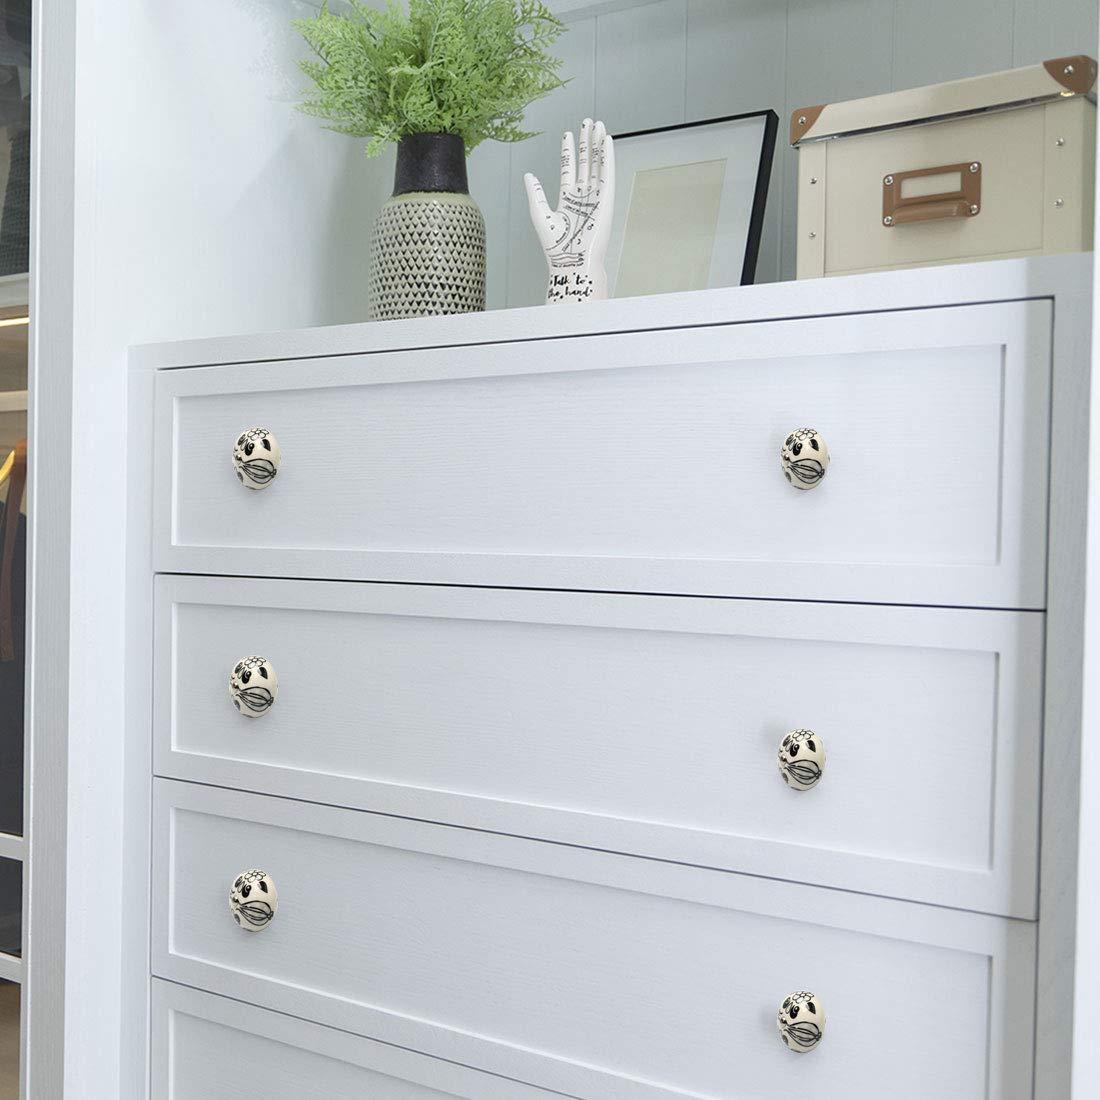 uxcell 8pcs Ceramic Knobs Vintage Knob Drawer Pull Handle Furniture Door Cabinet Cupboard Wardrobe Dresser Decoration #4